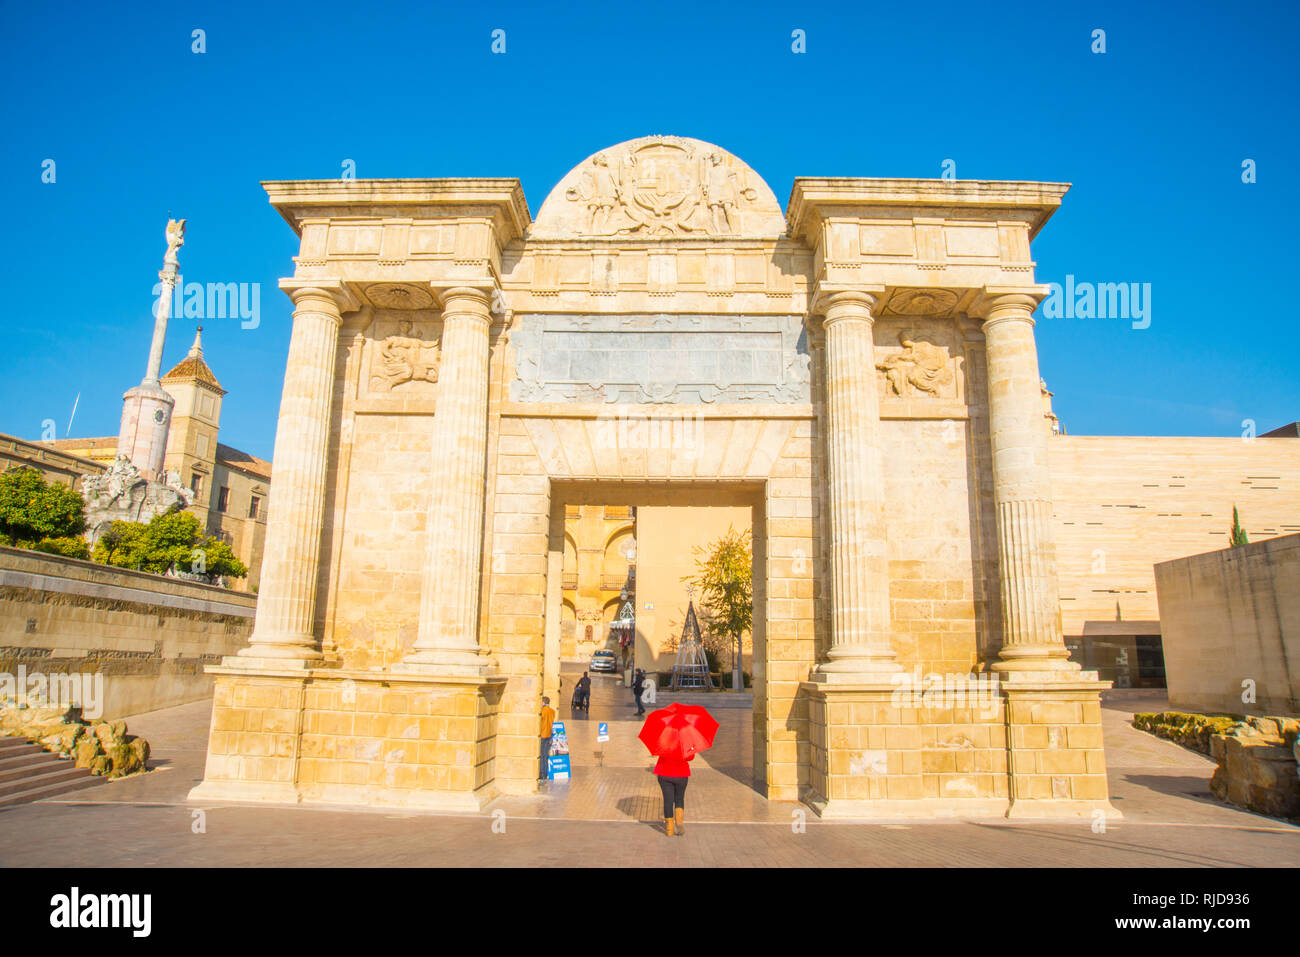 Puerta del Puente. Cordoba, Spain. - Stock Image